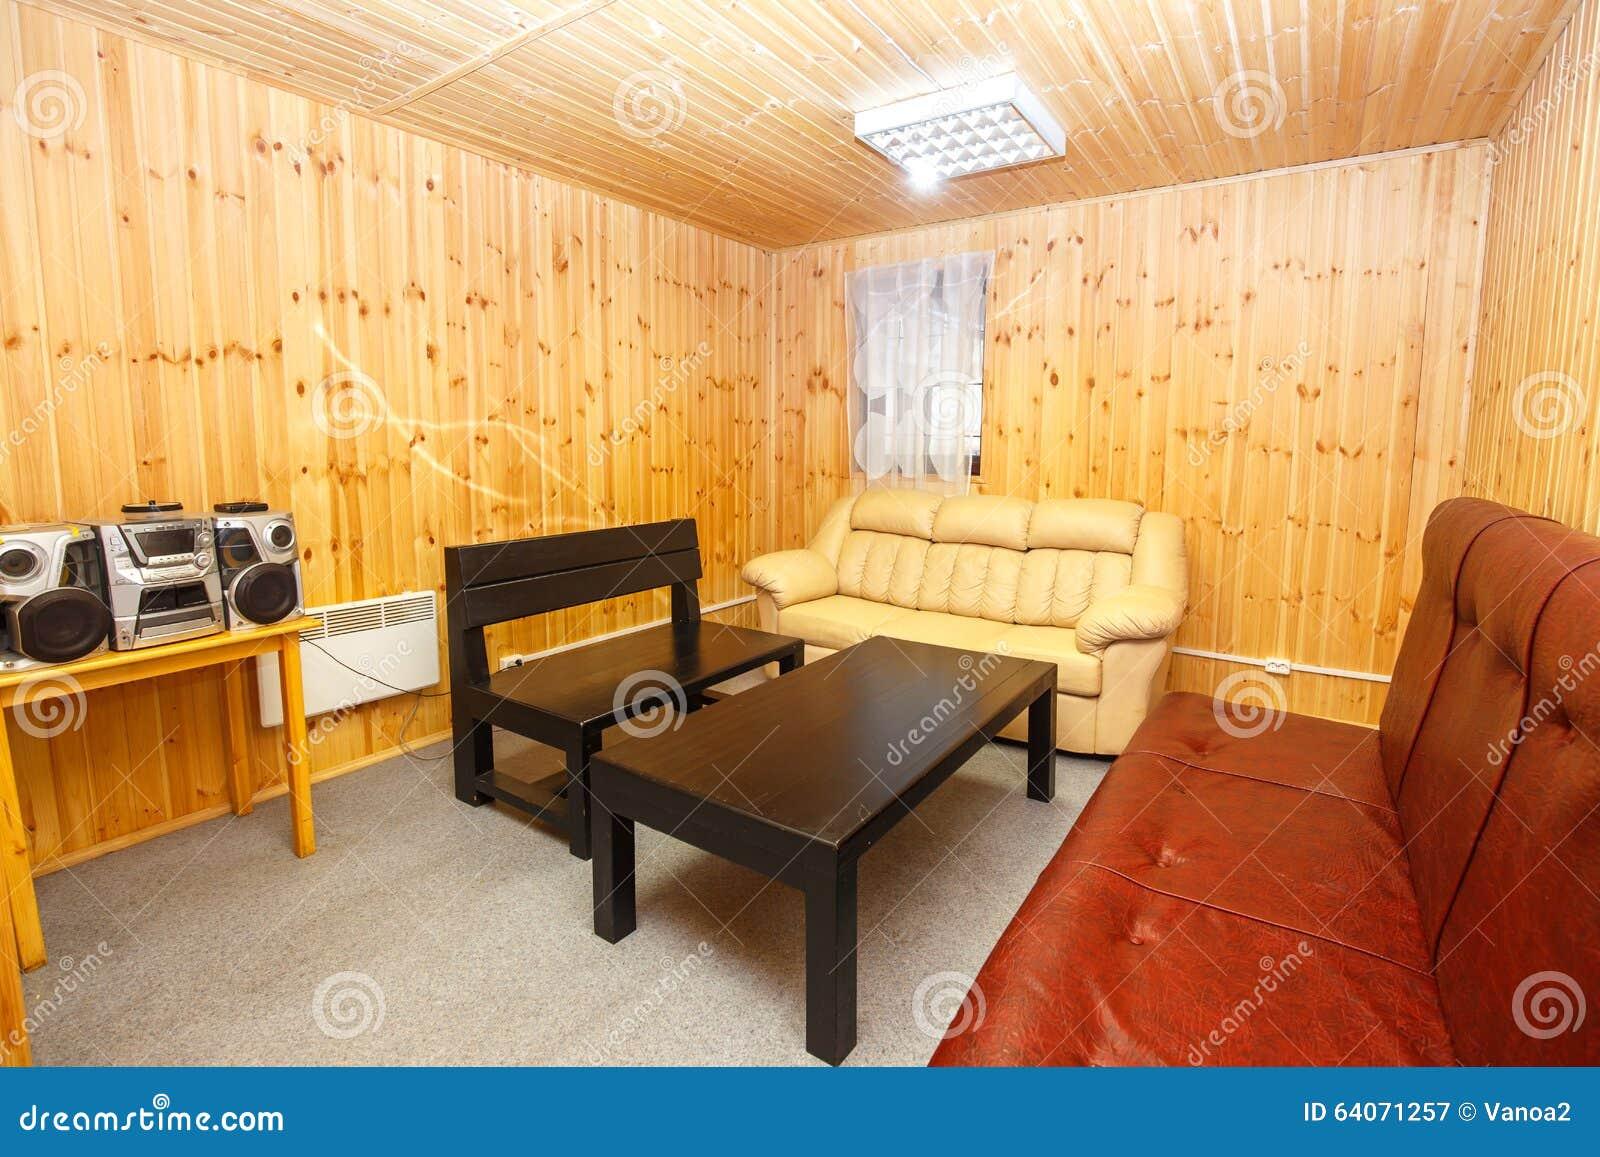 Free sauna costi excellent sauna infrarossi posto with - Costo sauna in casa ...